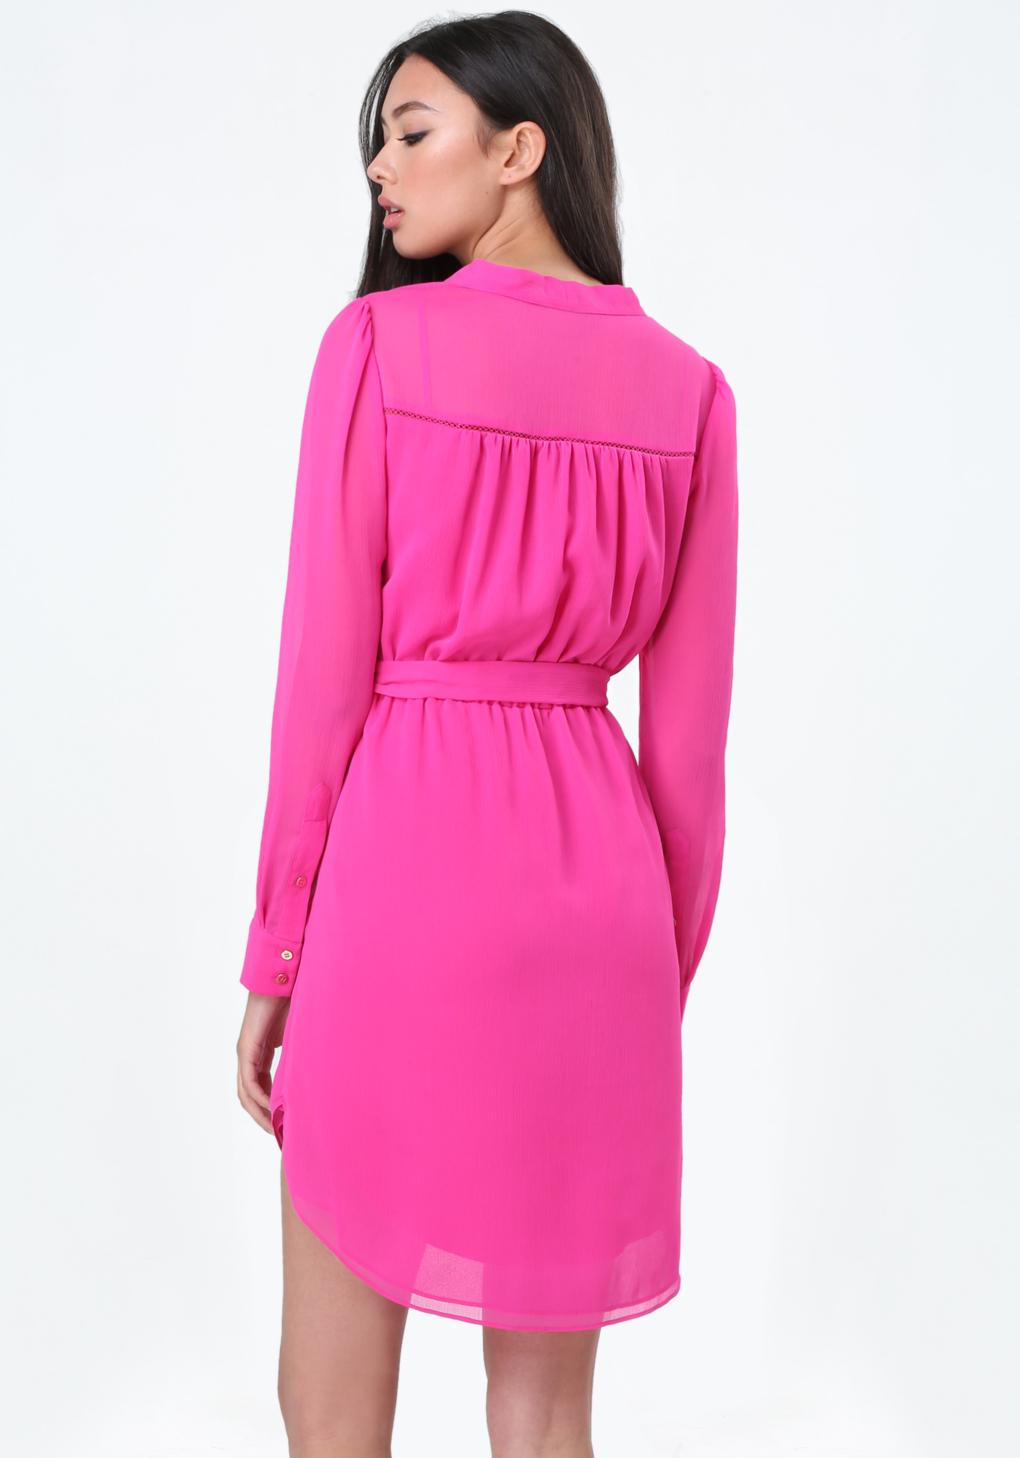 Bebe Chiffon Shirtdress in Pink | Lyst